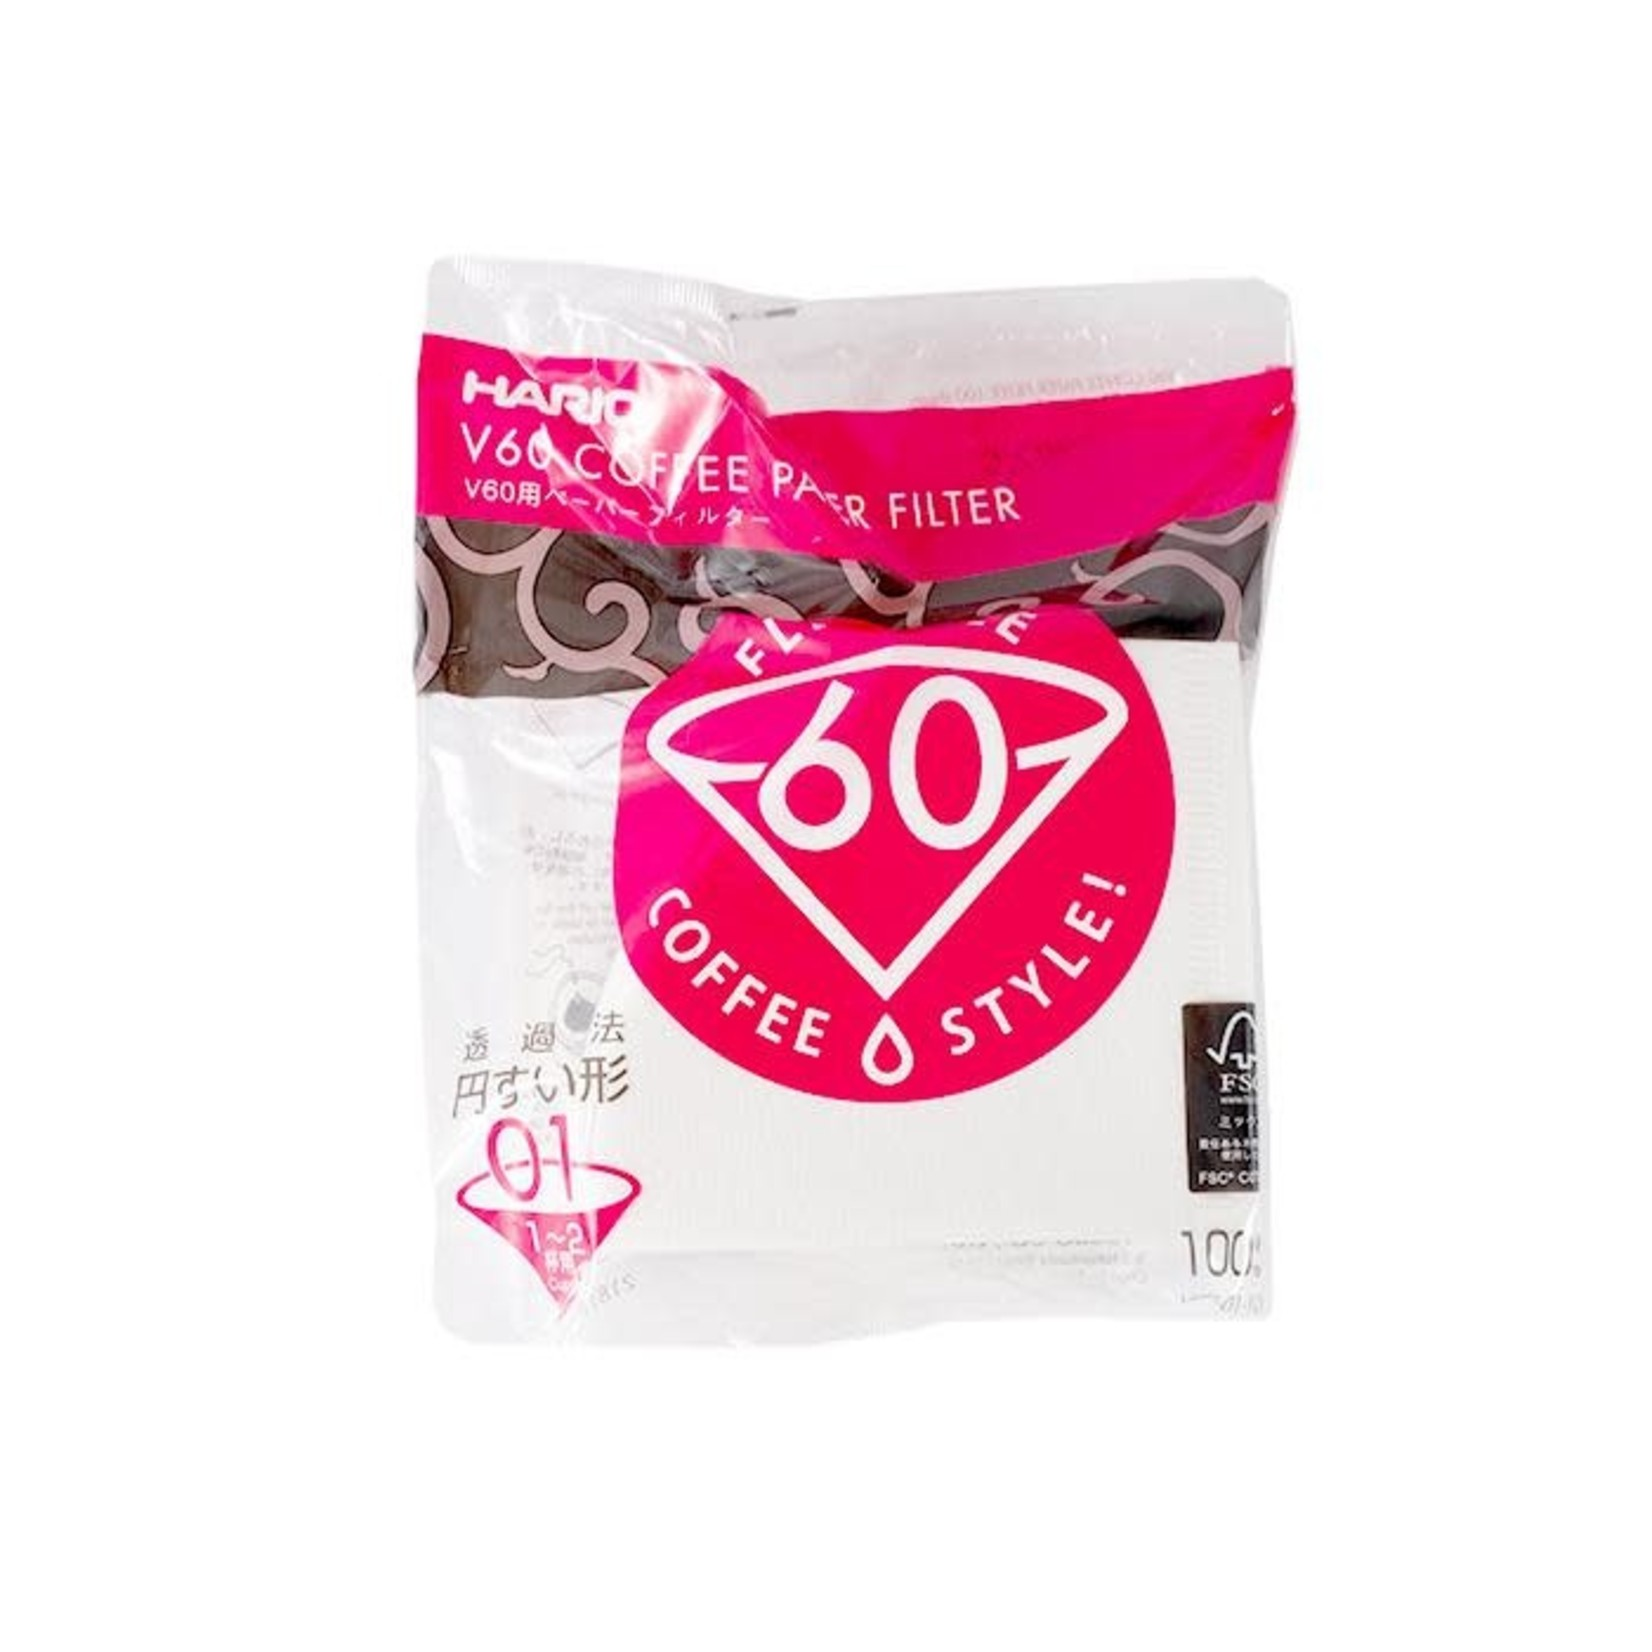 Hario Hario Paper Coffee Filters #1 White (100)